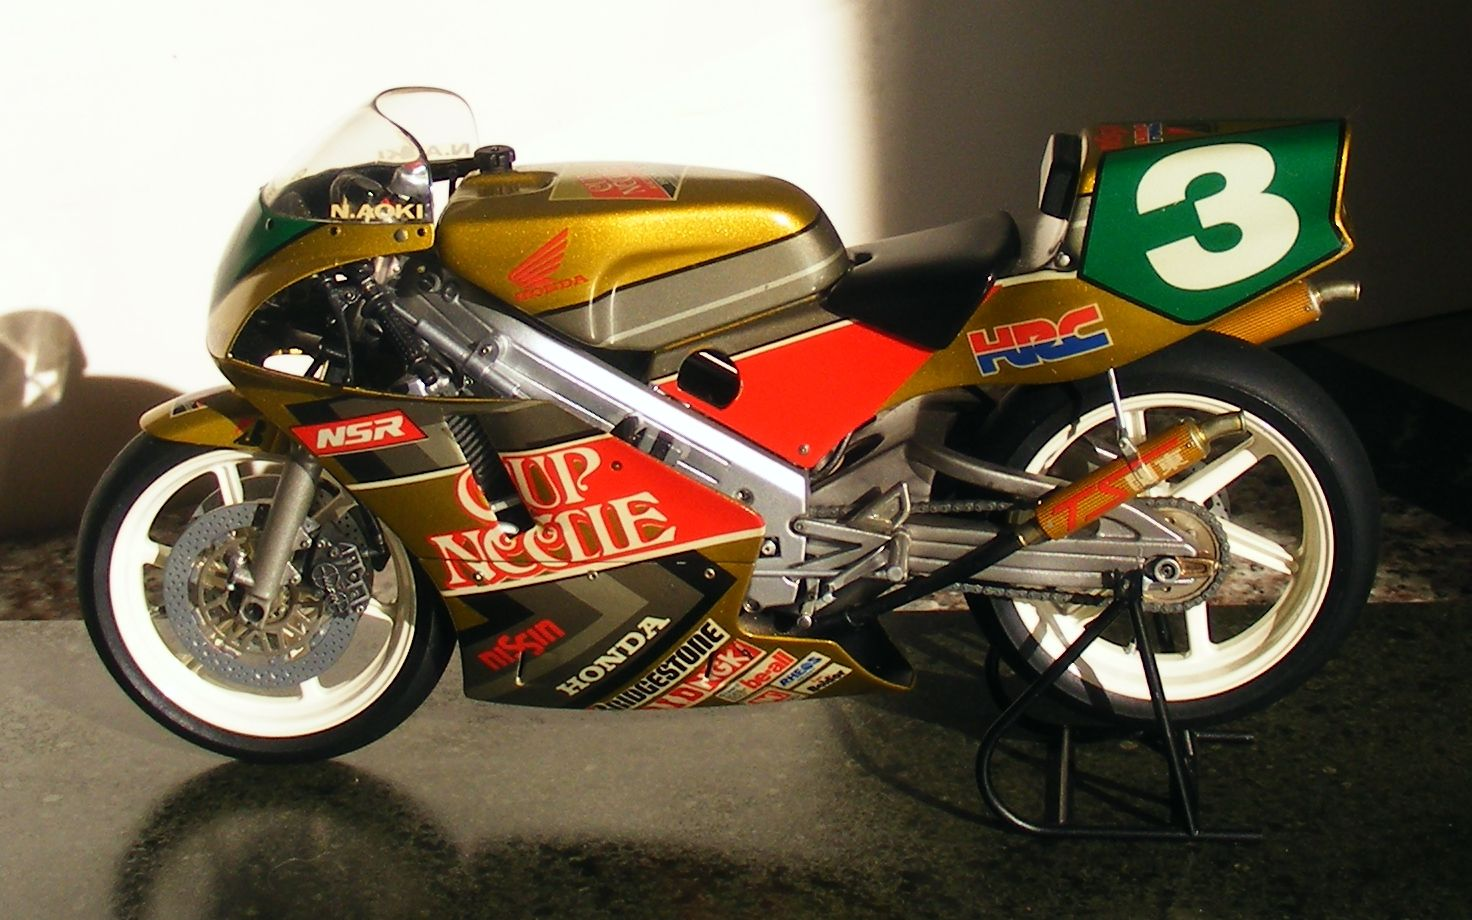 1/12 Honda NSR250 Cup Noodle - Motorcycles - ARC Discussion Forums